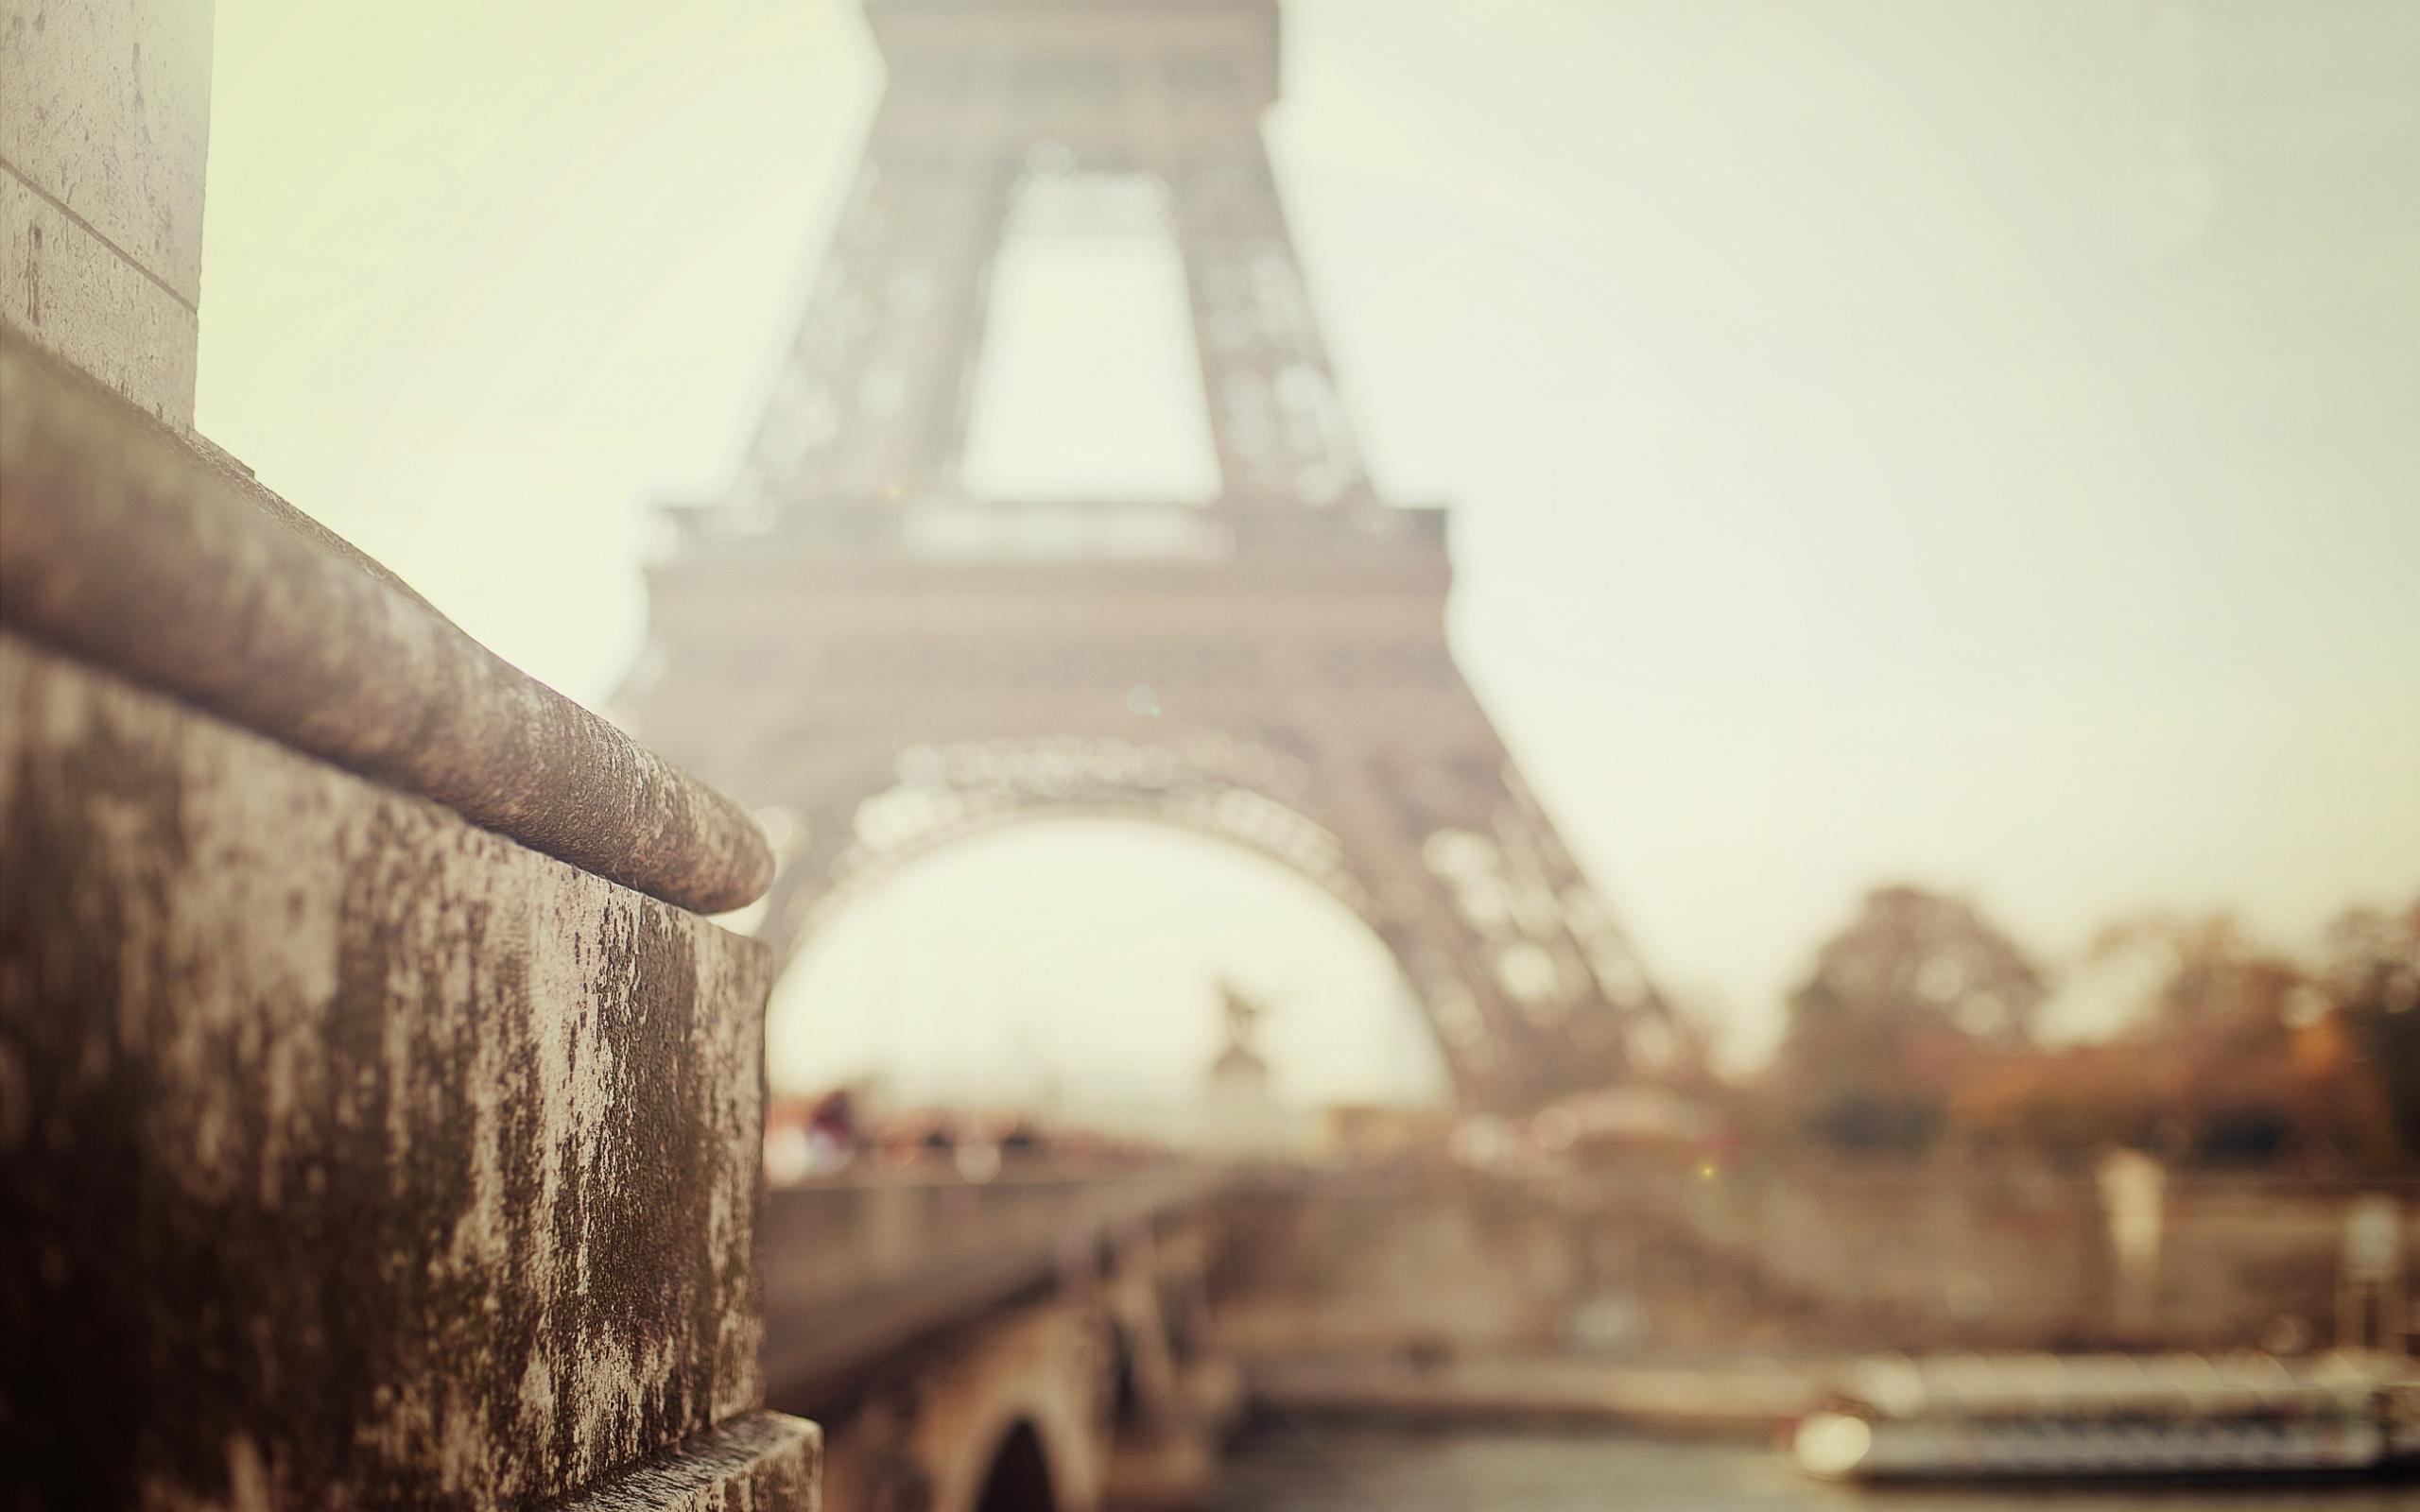 Paris eiffel tower blurred